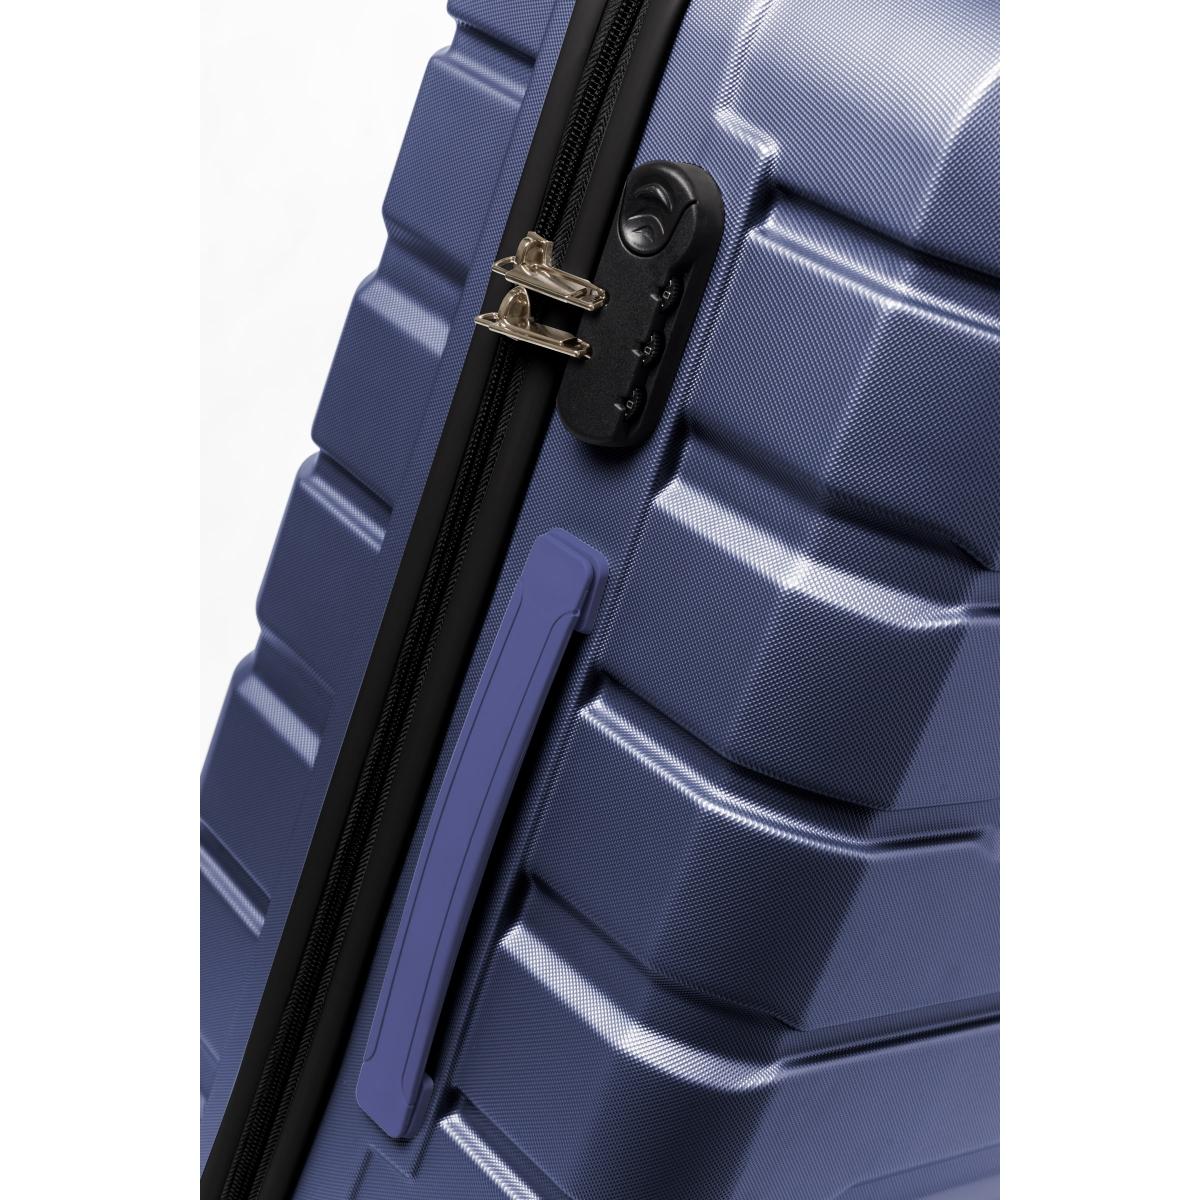 Gedox Abs Premium Tonaton 3'lü Valiz Seyahat Seti - Model:500.04 Lacivert